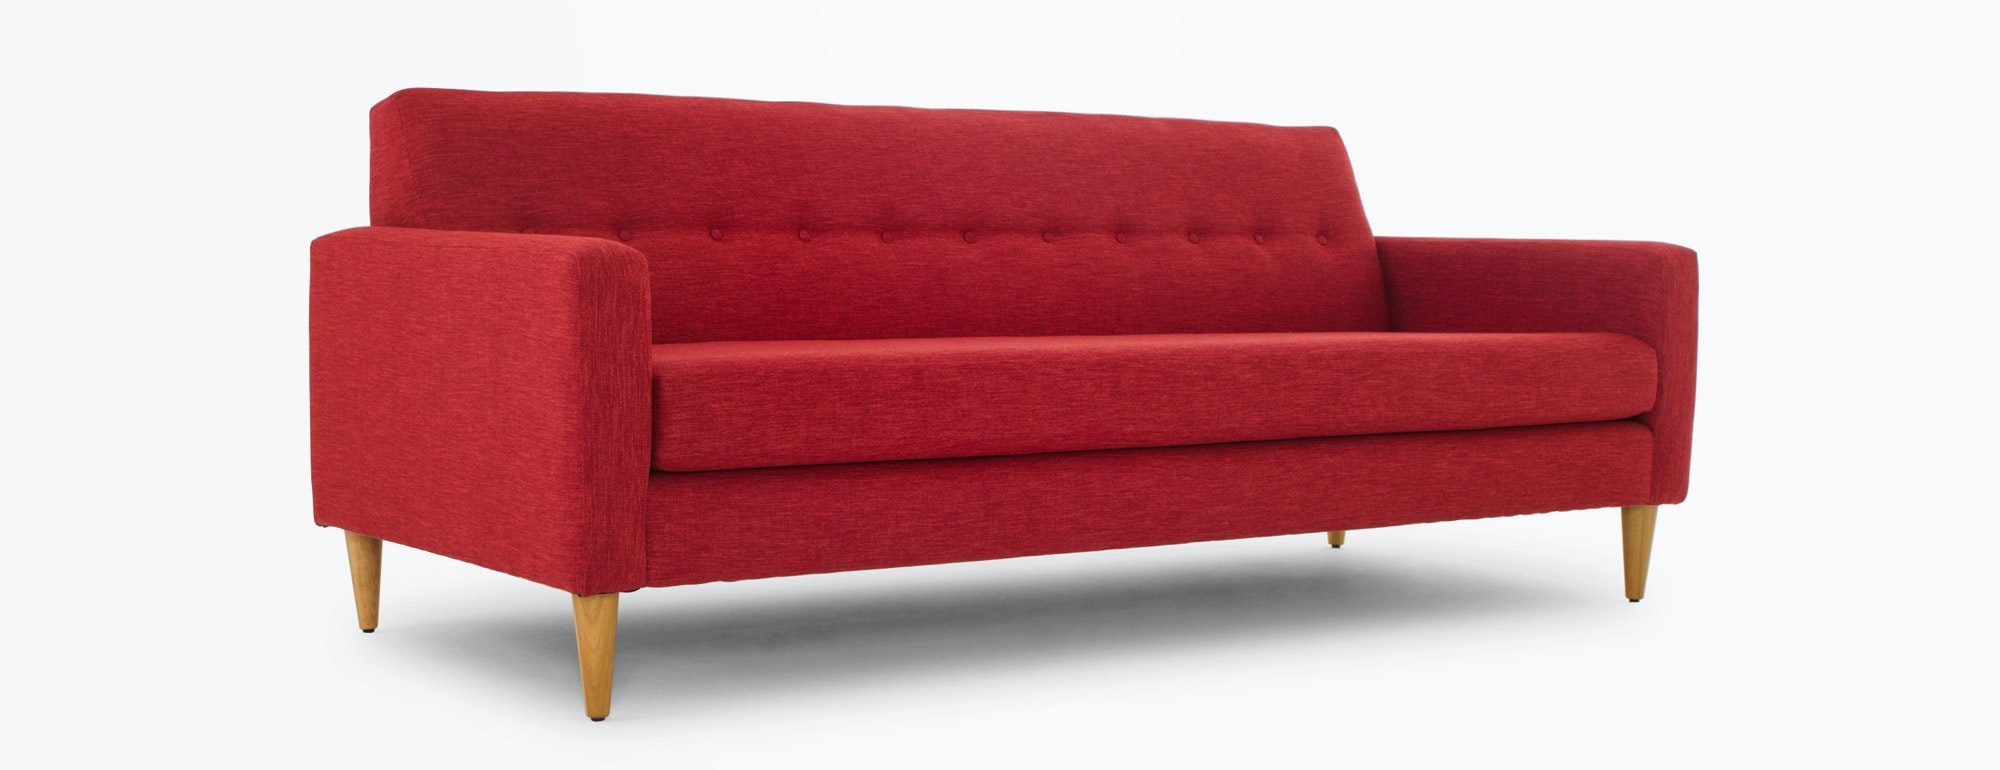 best sofa deals canada bed designer largo models kartell thesofa